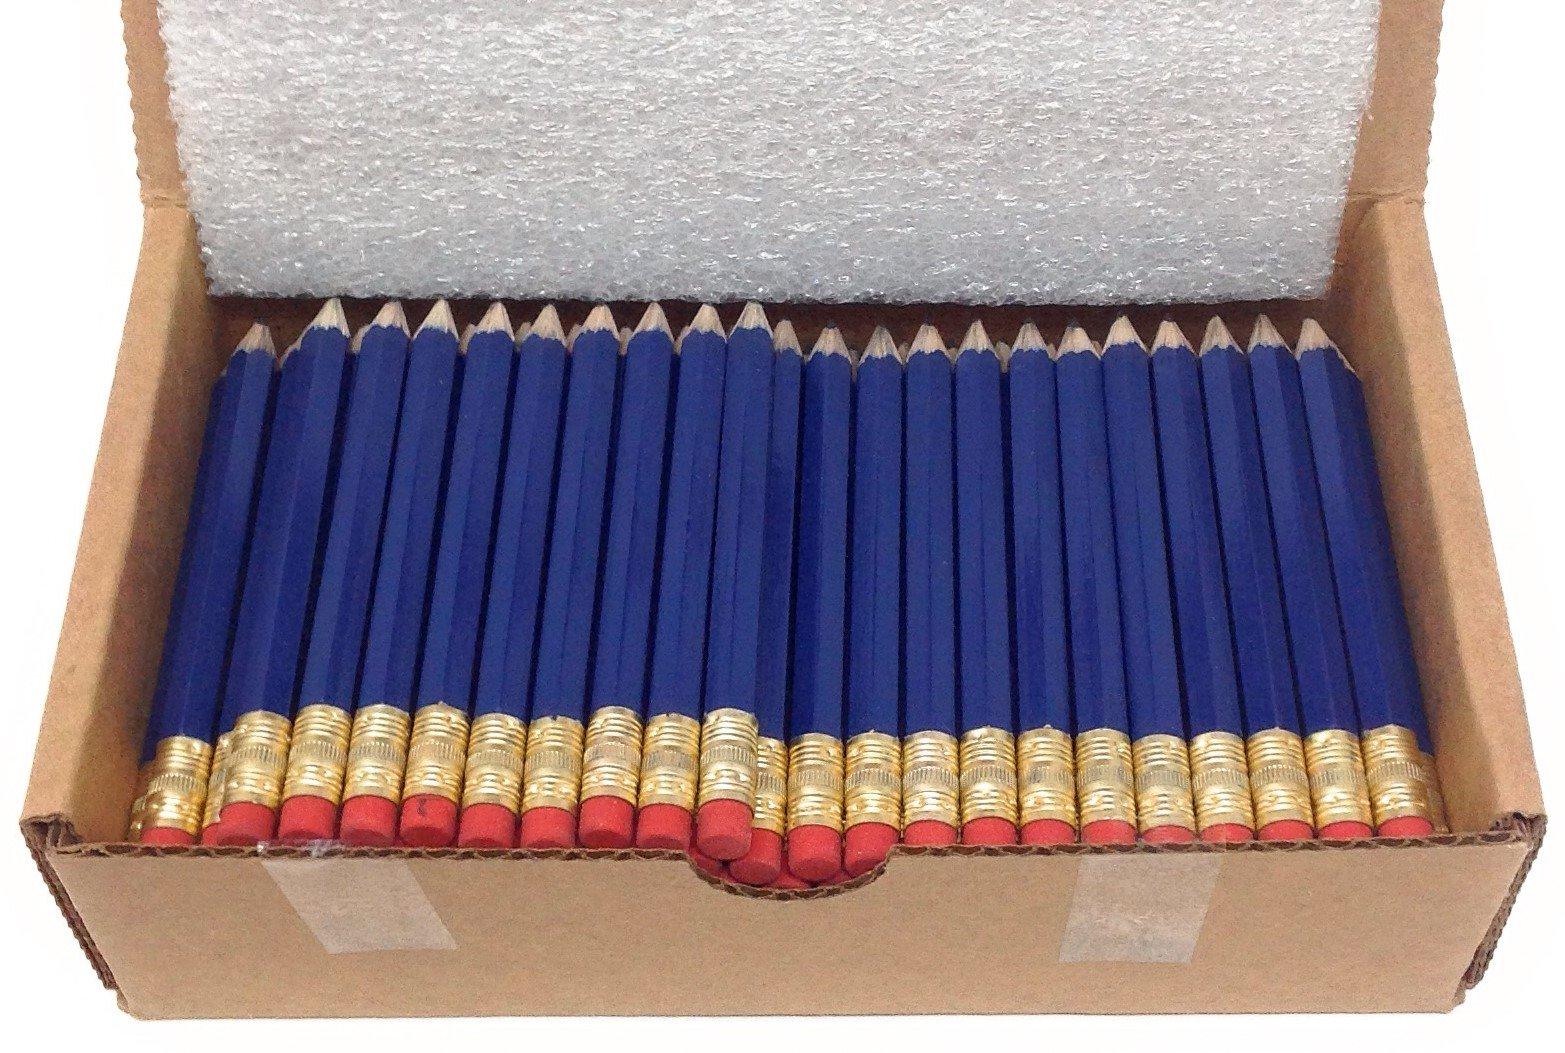 Half Pencils with Eraser, Golf, Classroom, Church, Hexagon, 2 Pencil, Sharpened, Box of 144. Color: Navy Blue by beacon-ridge (Image #1)